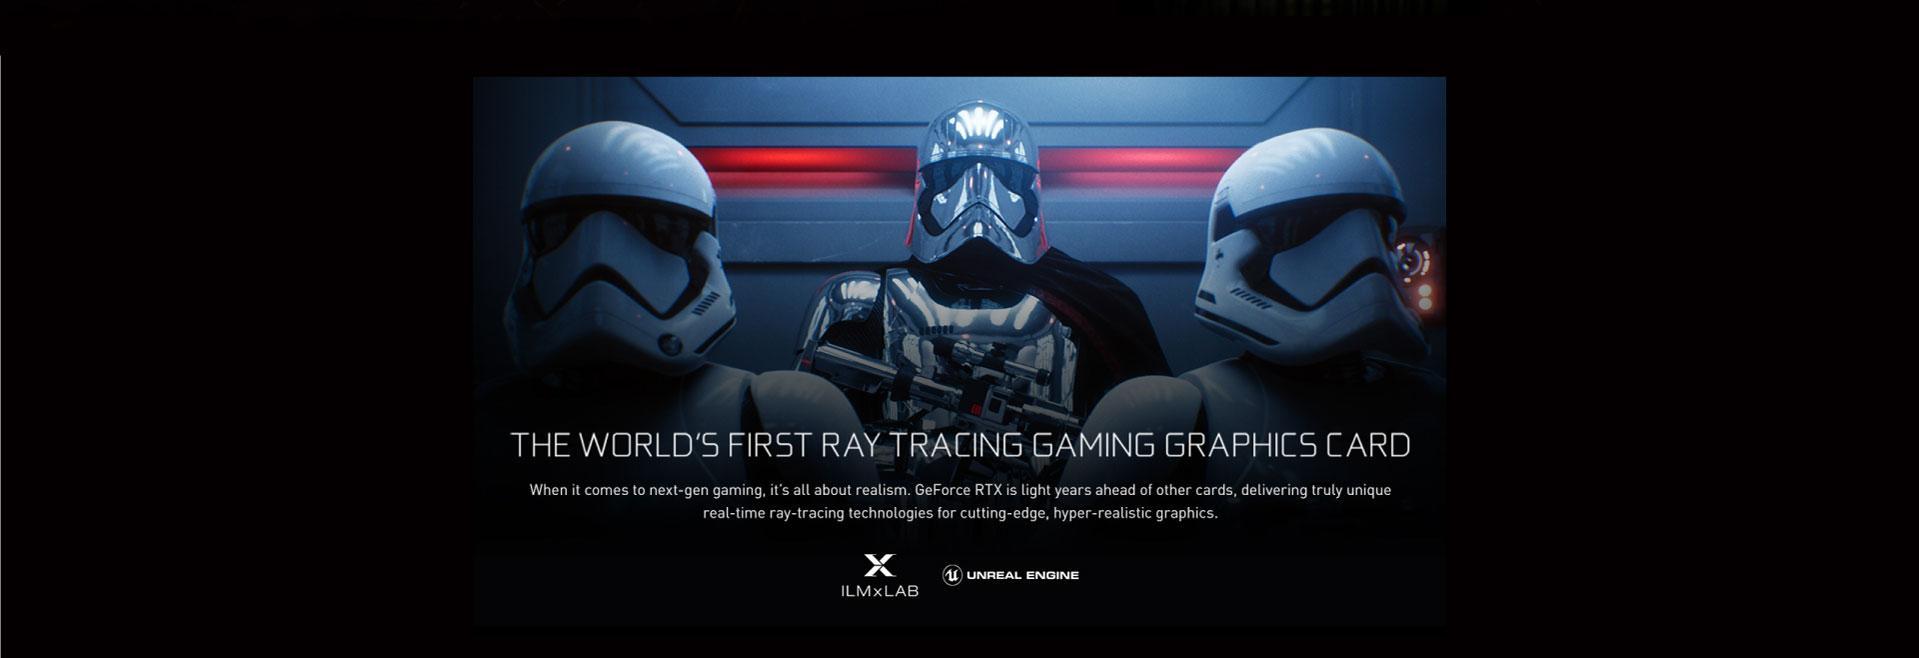 2060_Gaming_OC_X2_VA15L_1920w_02.jpg (96 KB)